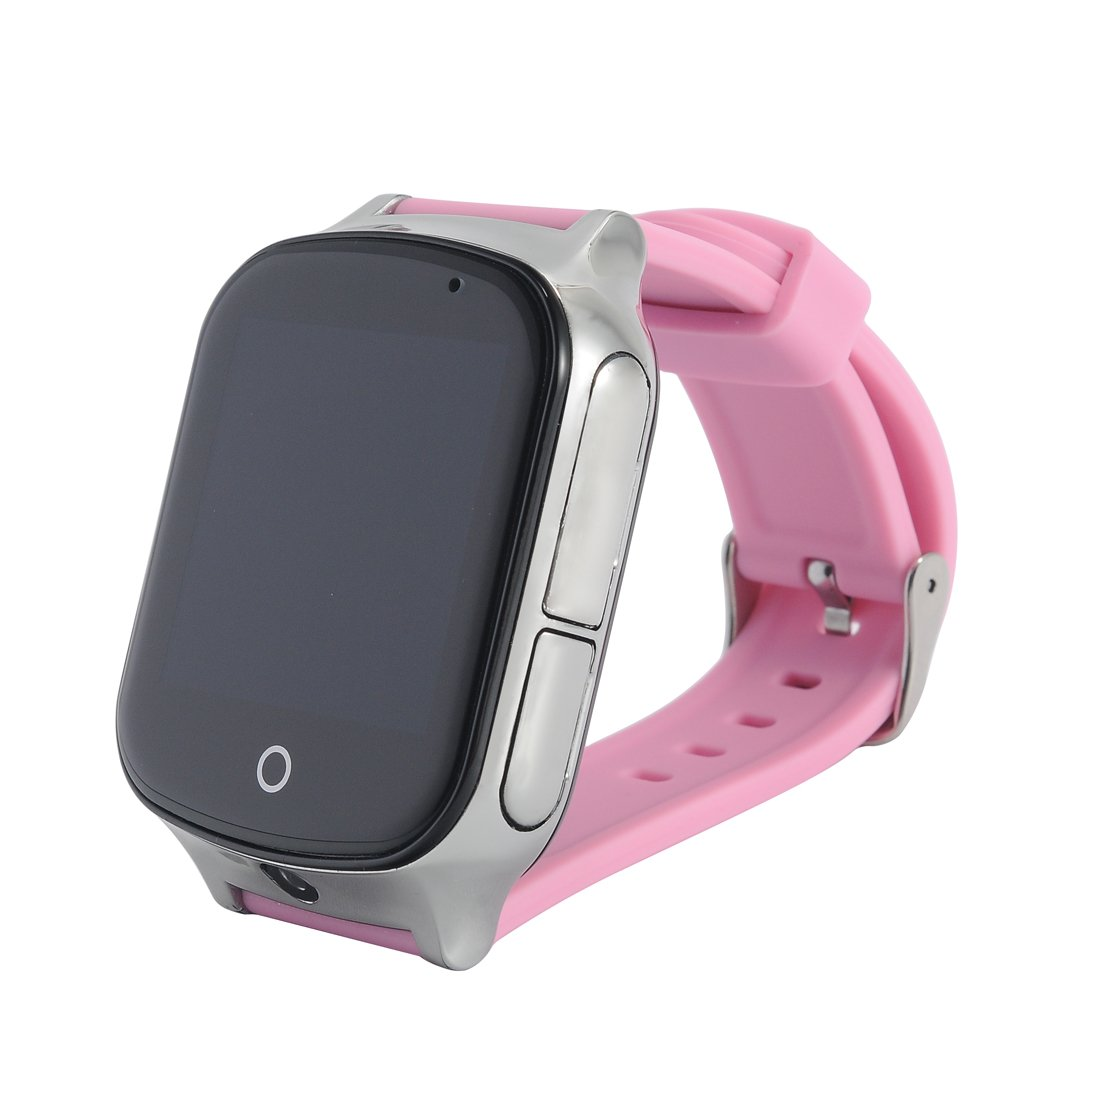 WIKI Intelligent Positioning Watch For Elderly and Kids